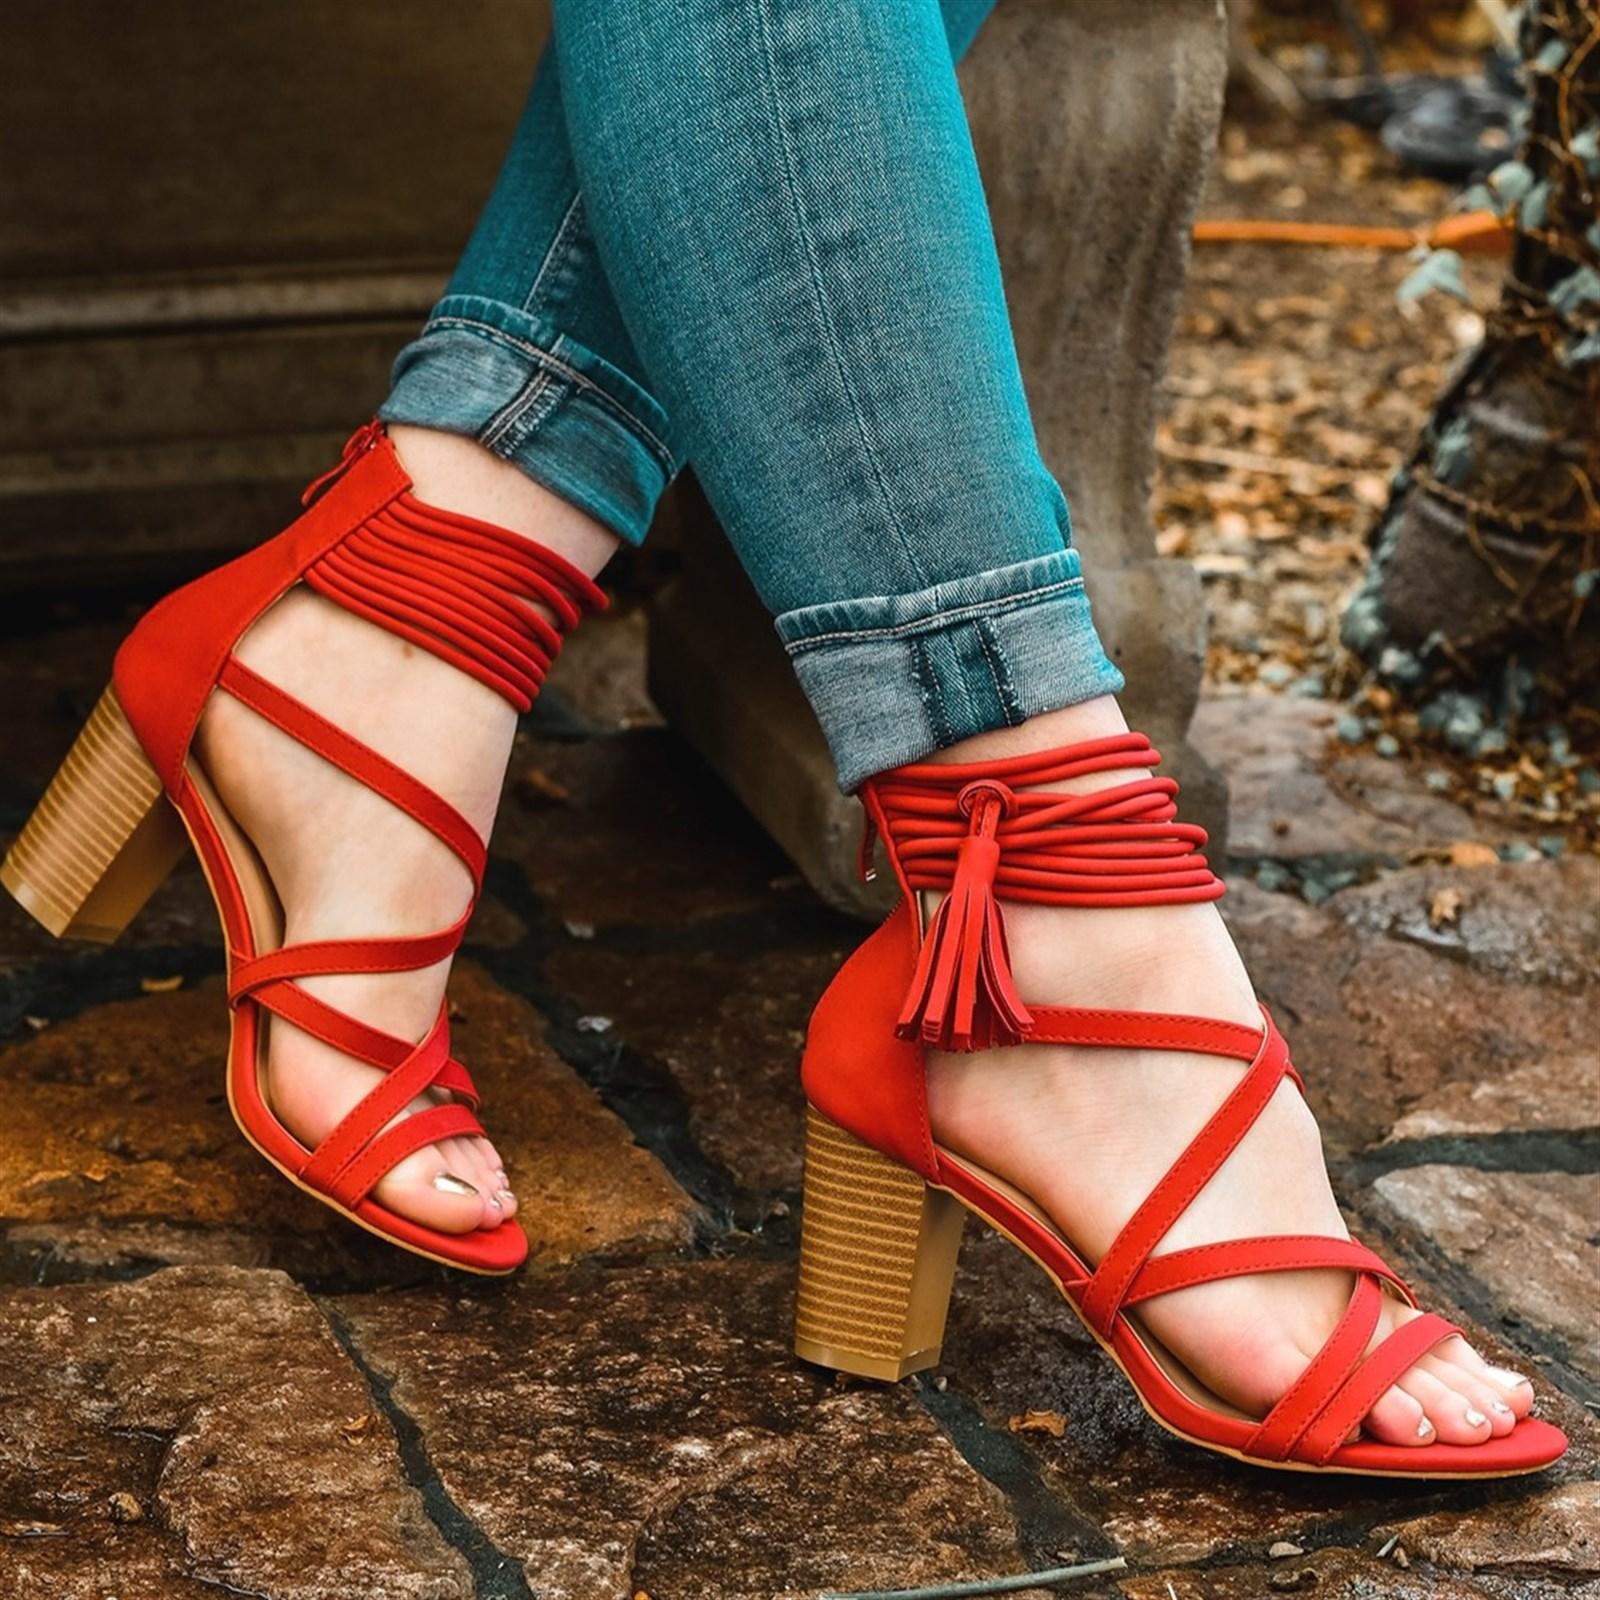 Strappy Tassel High Heels